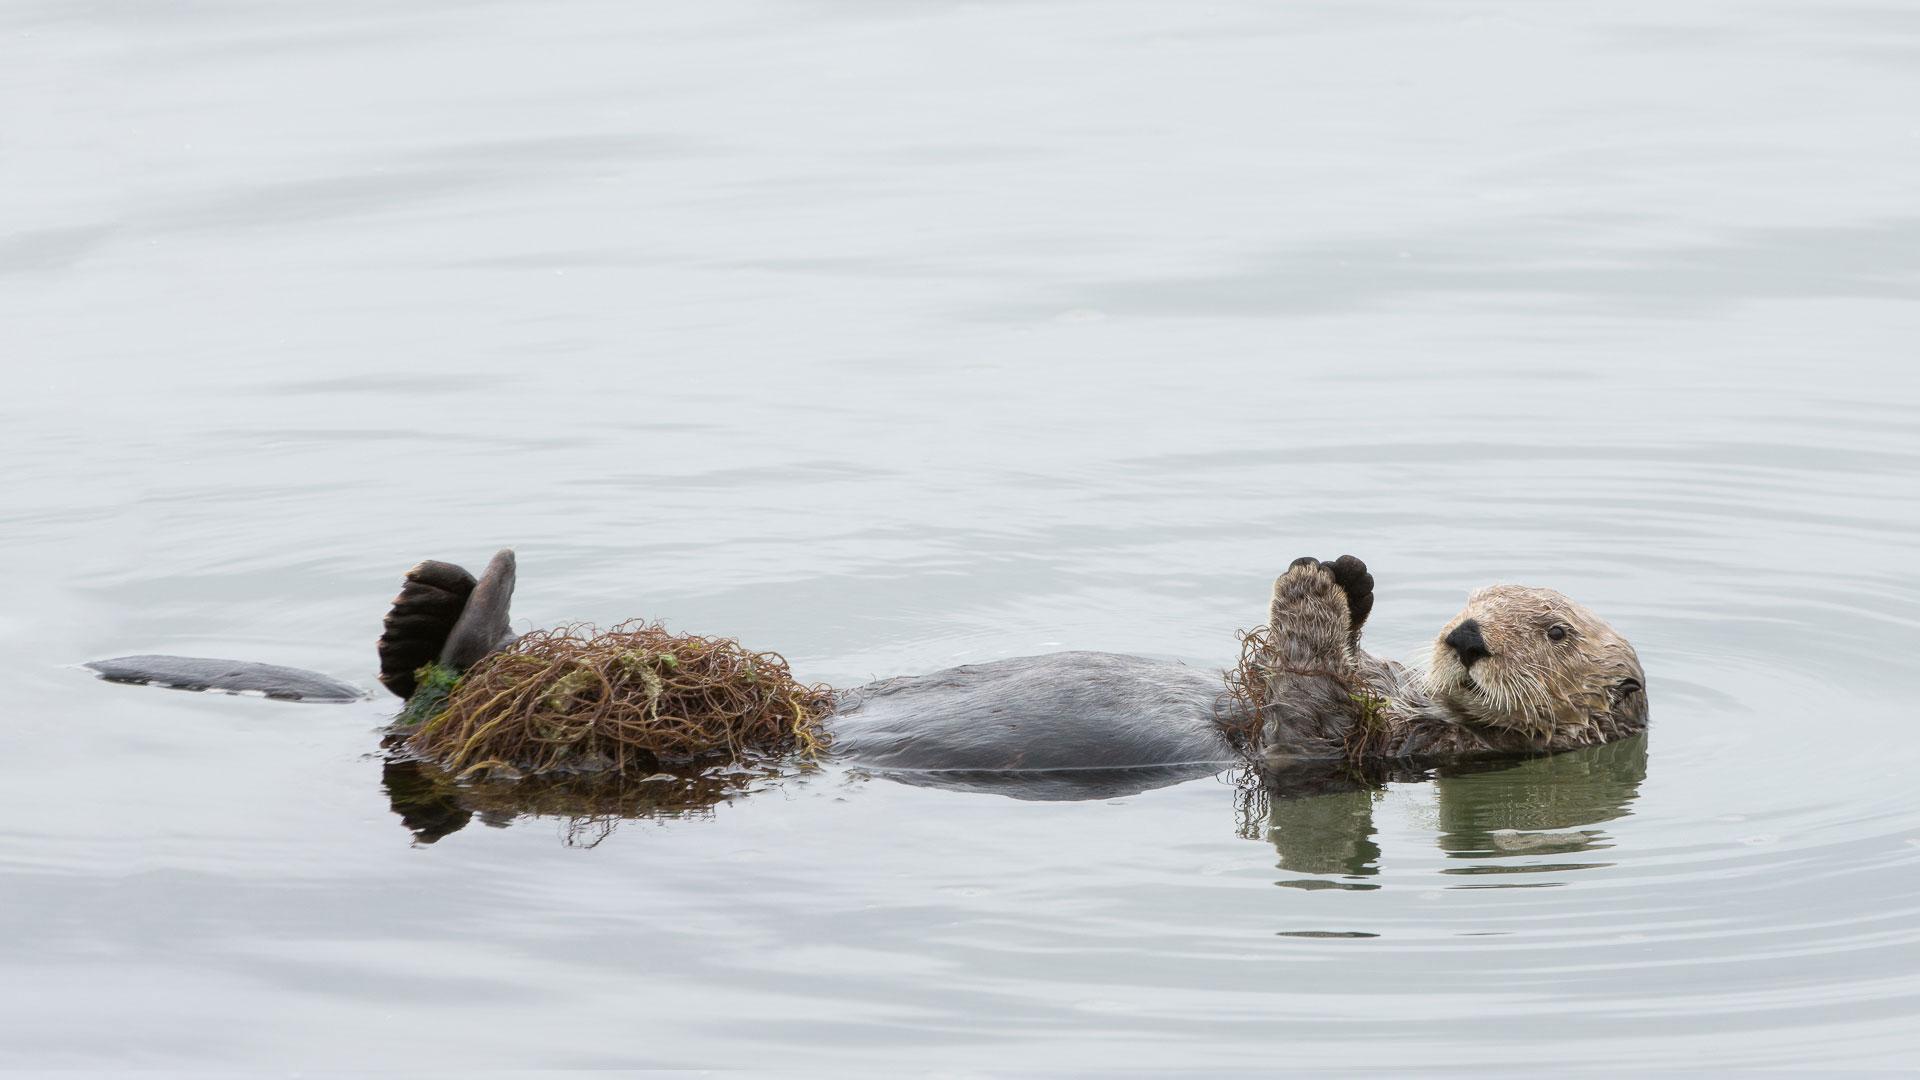 California Sea Otter  (Enhydra lutris) - Moss Landing  Nikon D7200 + Nikon 200-400mm f4 VR1 @ ISO 400